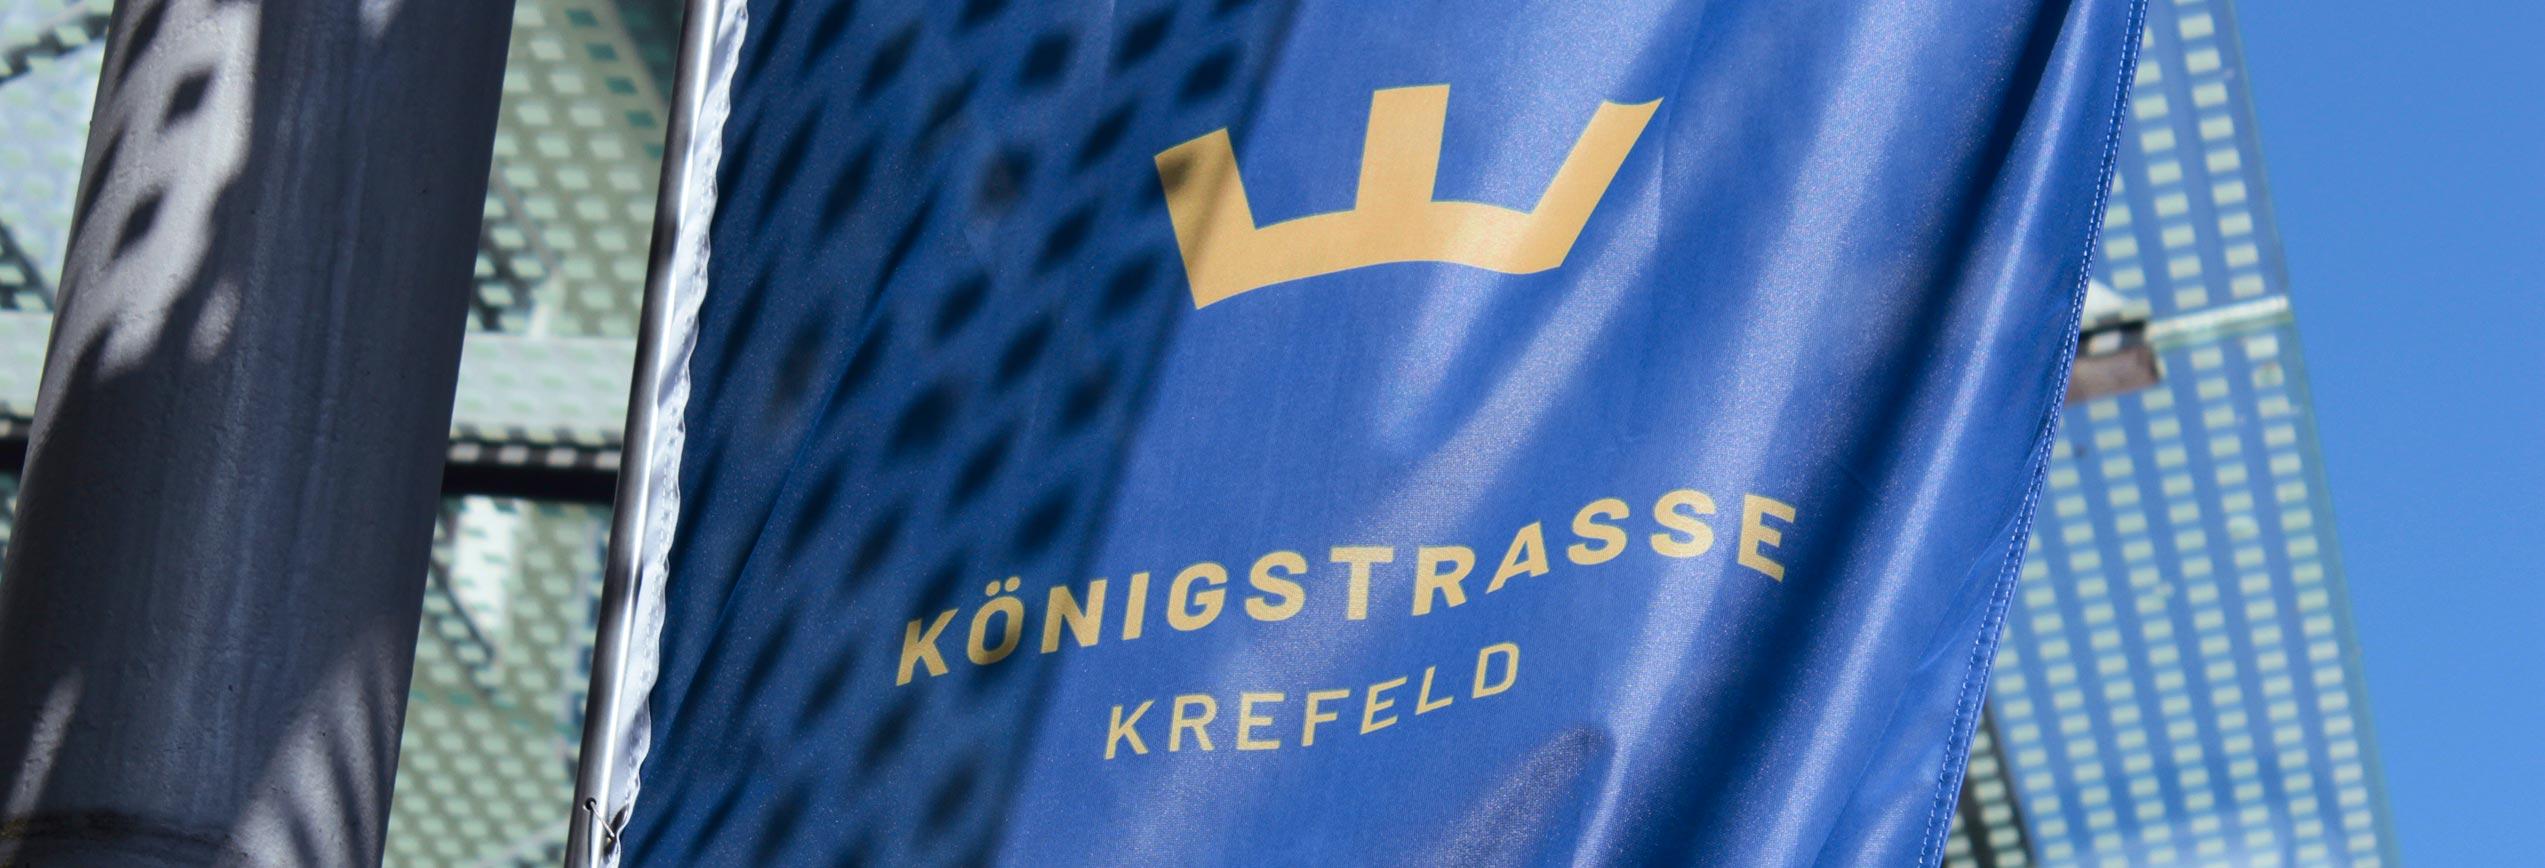 Königsstrasse Krefeld Flagge mit neuem Logo